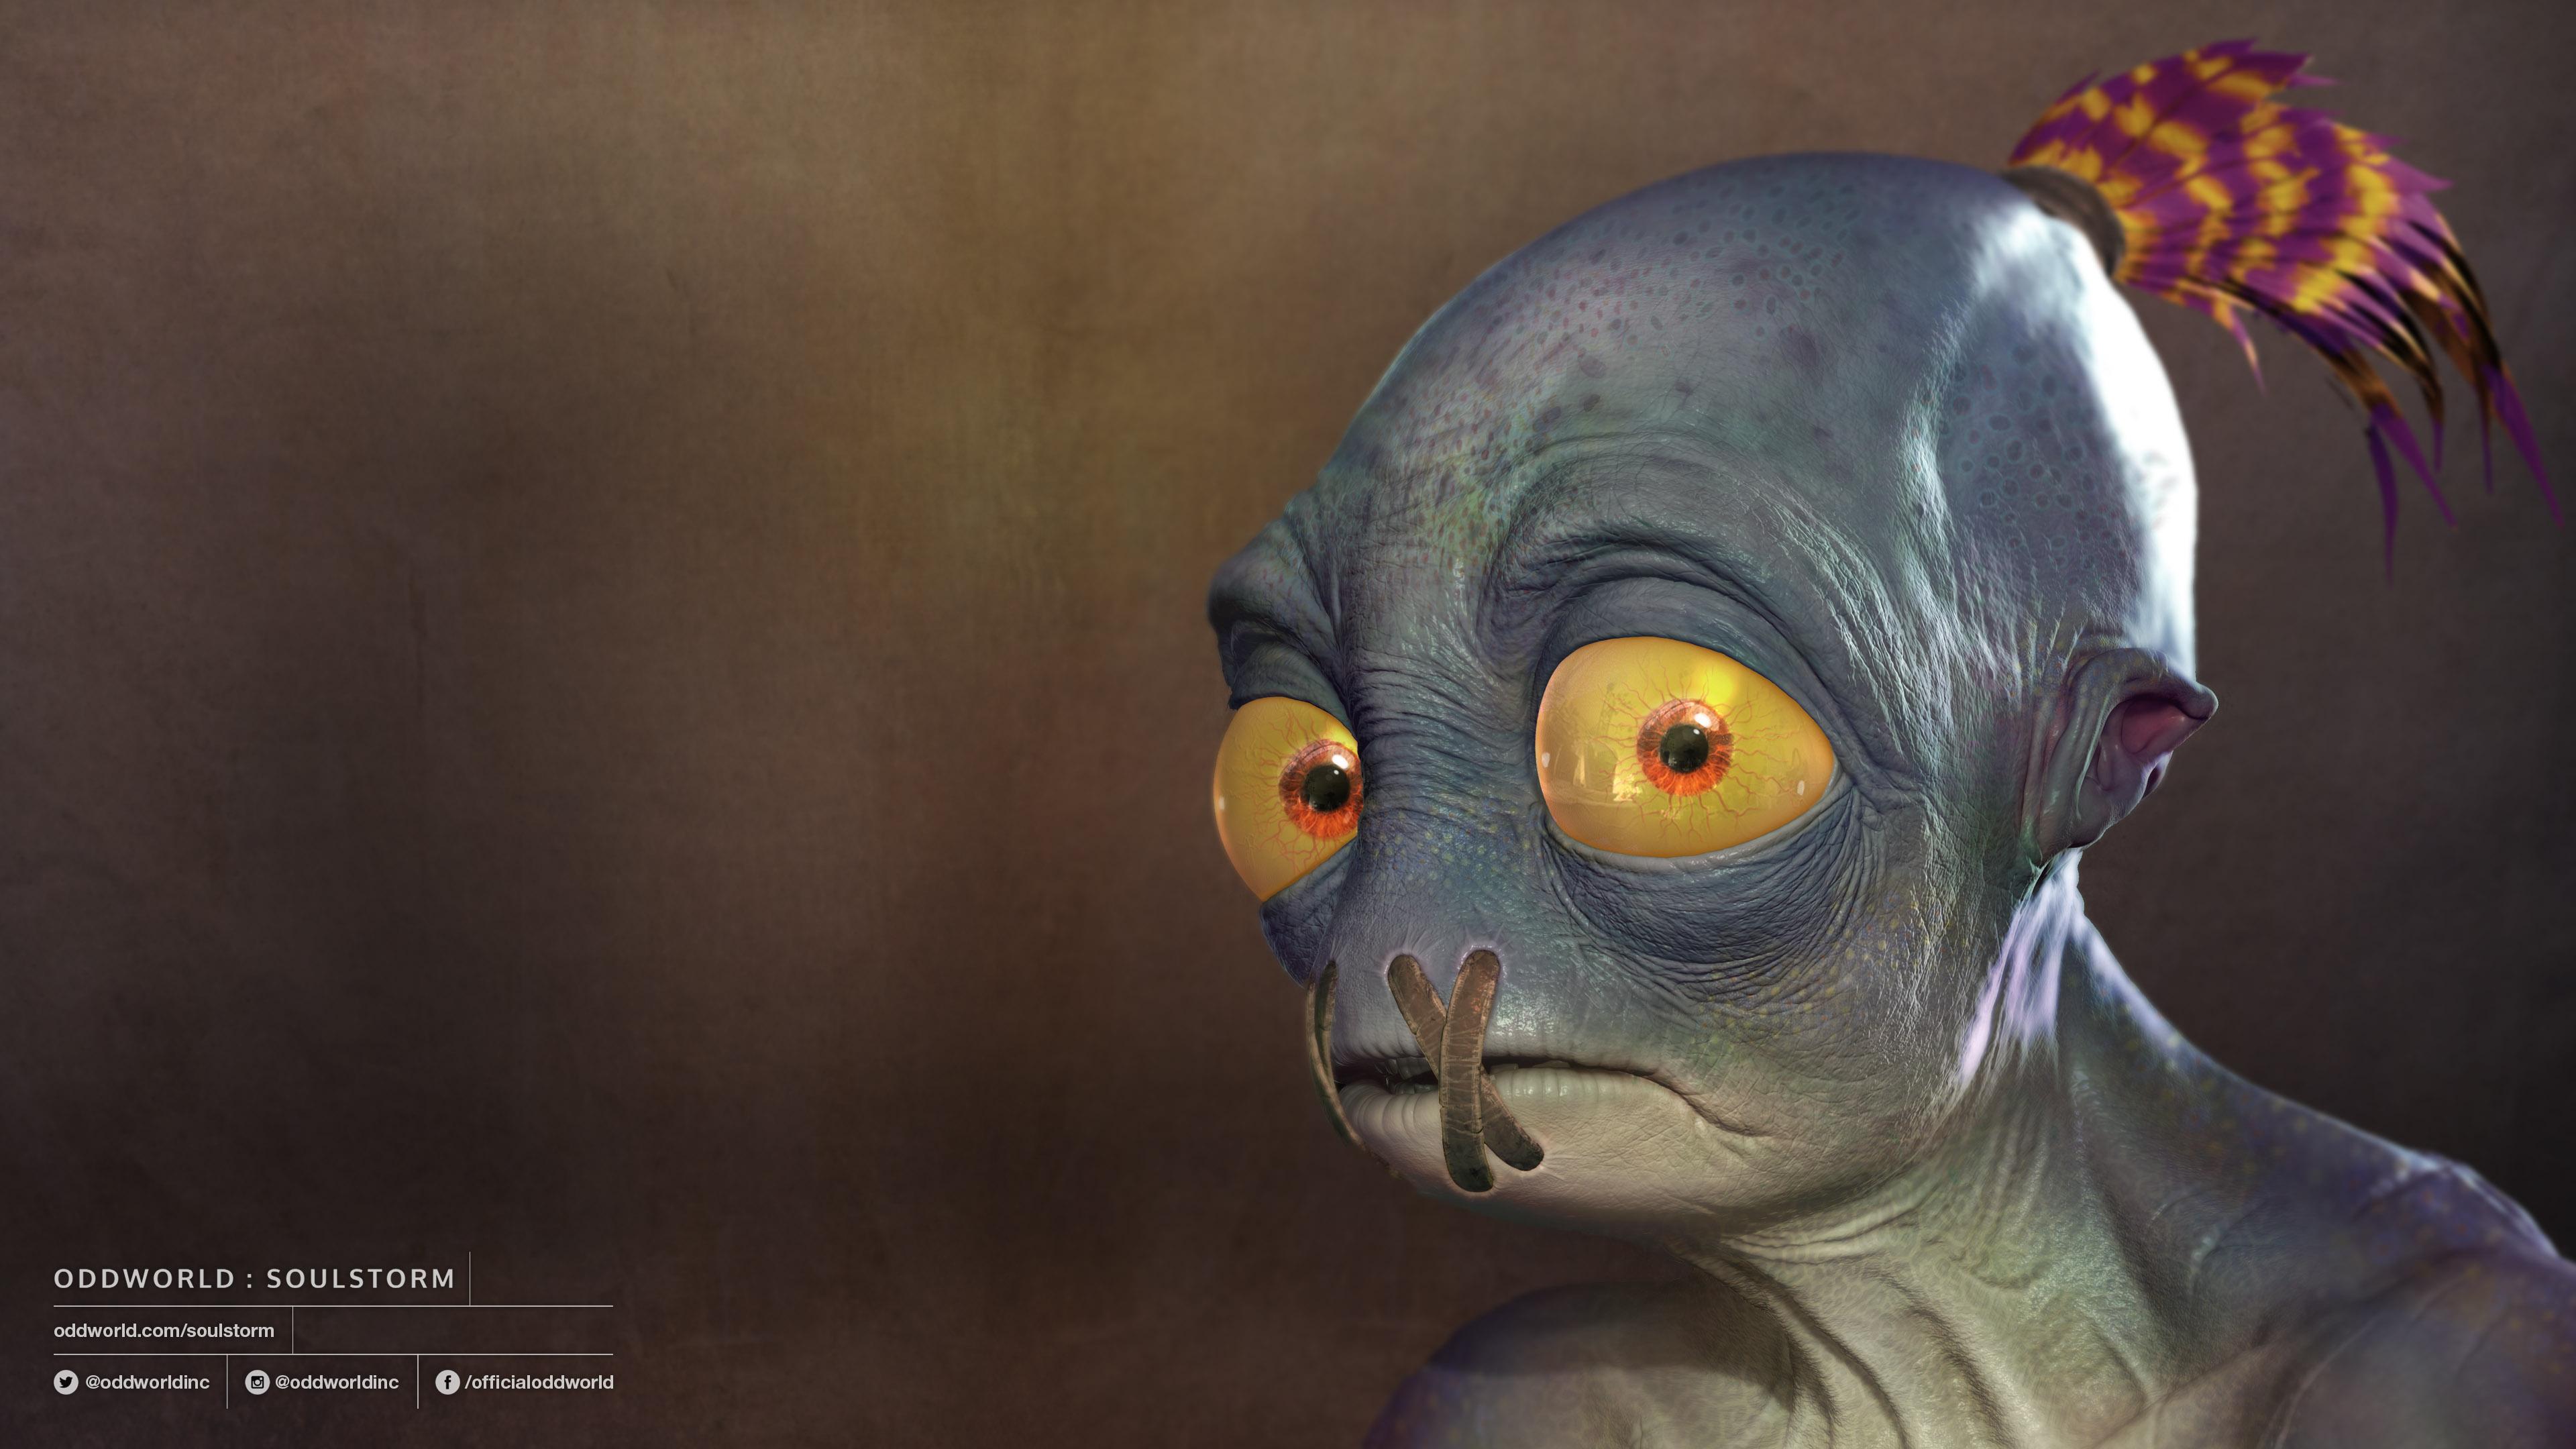 Mudokon: Abe - Oddworld: Soulstorm 4K